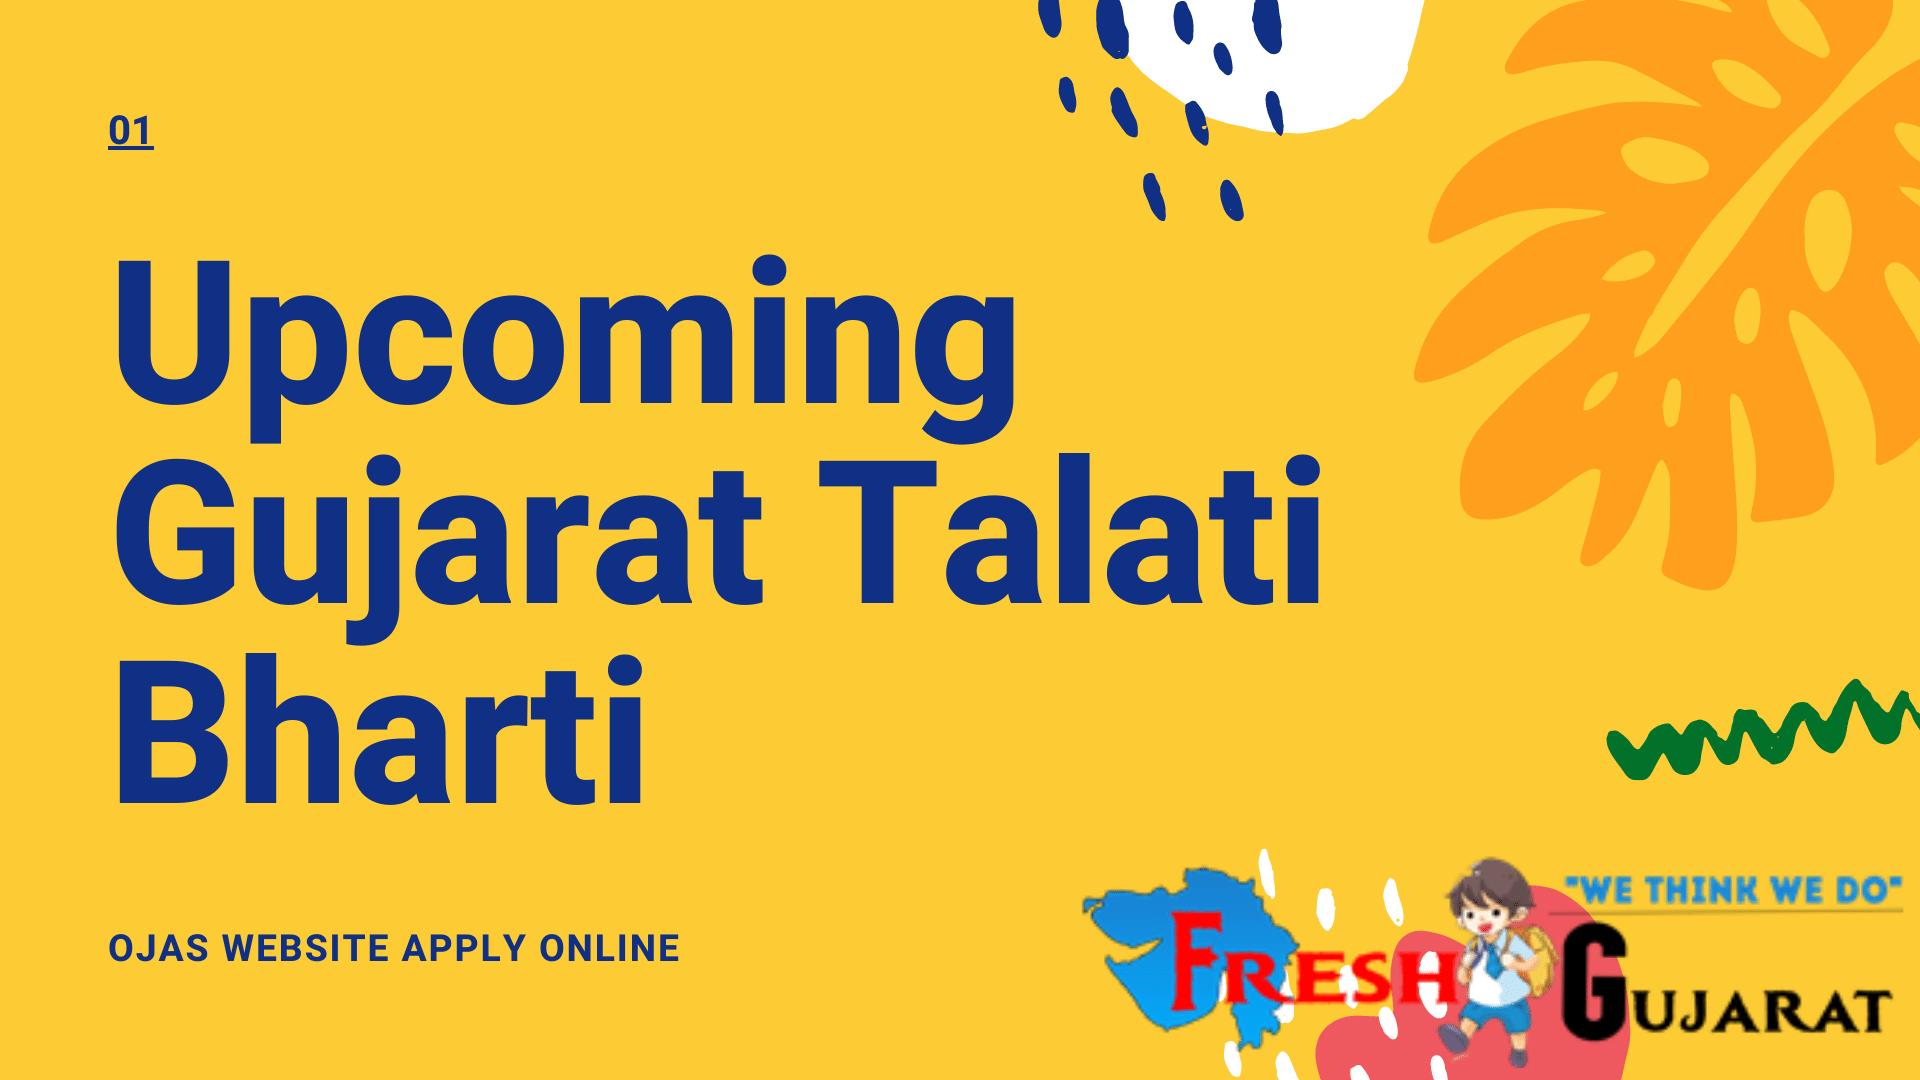 Upcoming Gujarat Talati Bharti